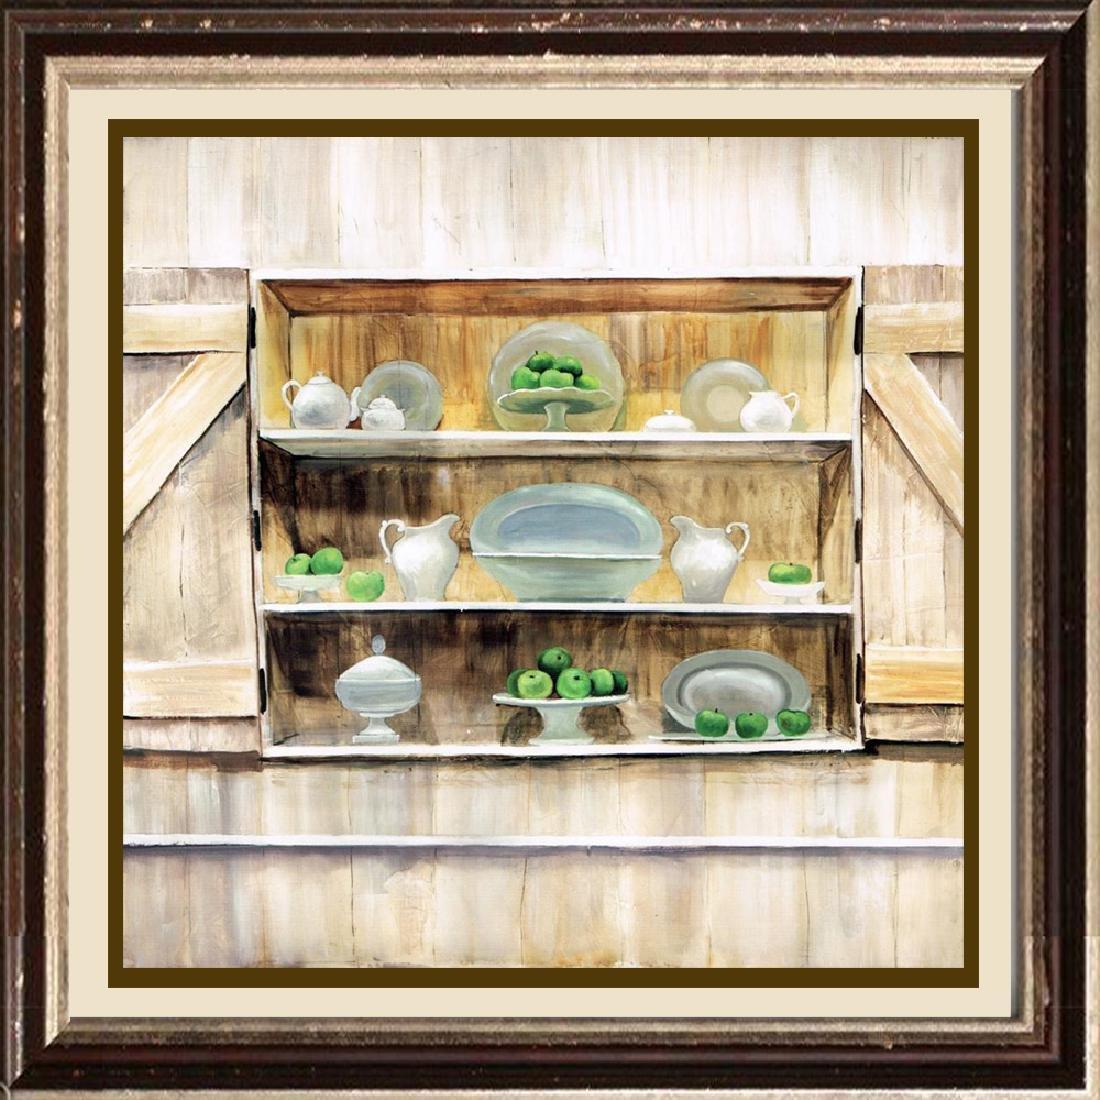 Neum Collection Tetera II Giclee on Canvas  39 x 39